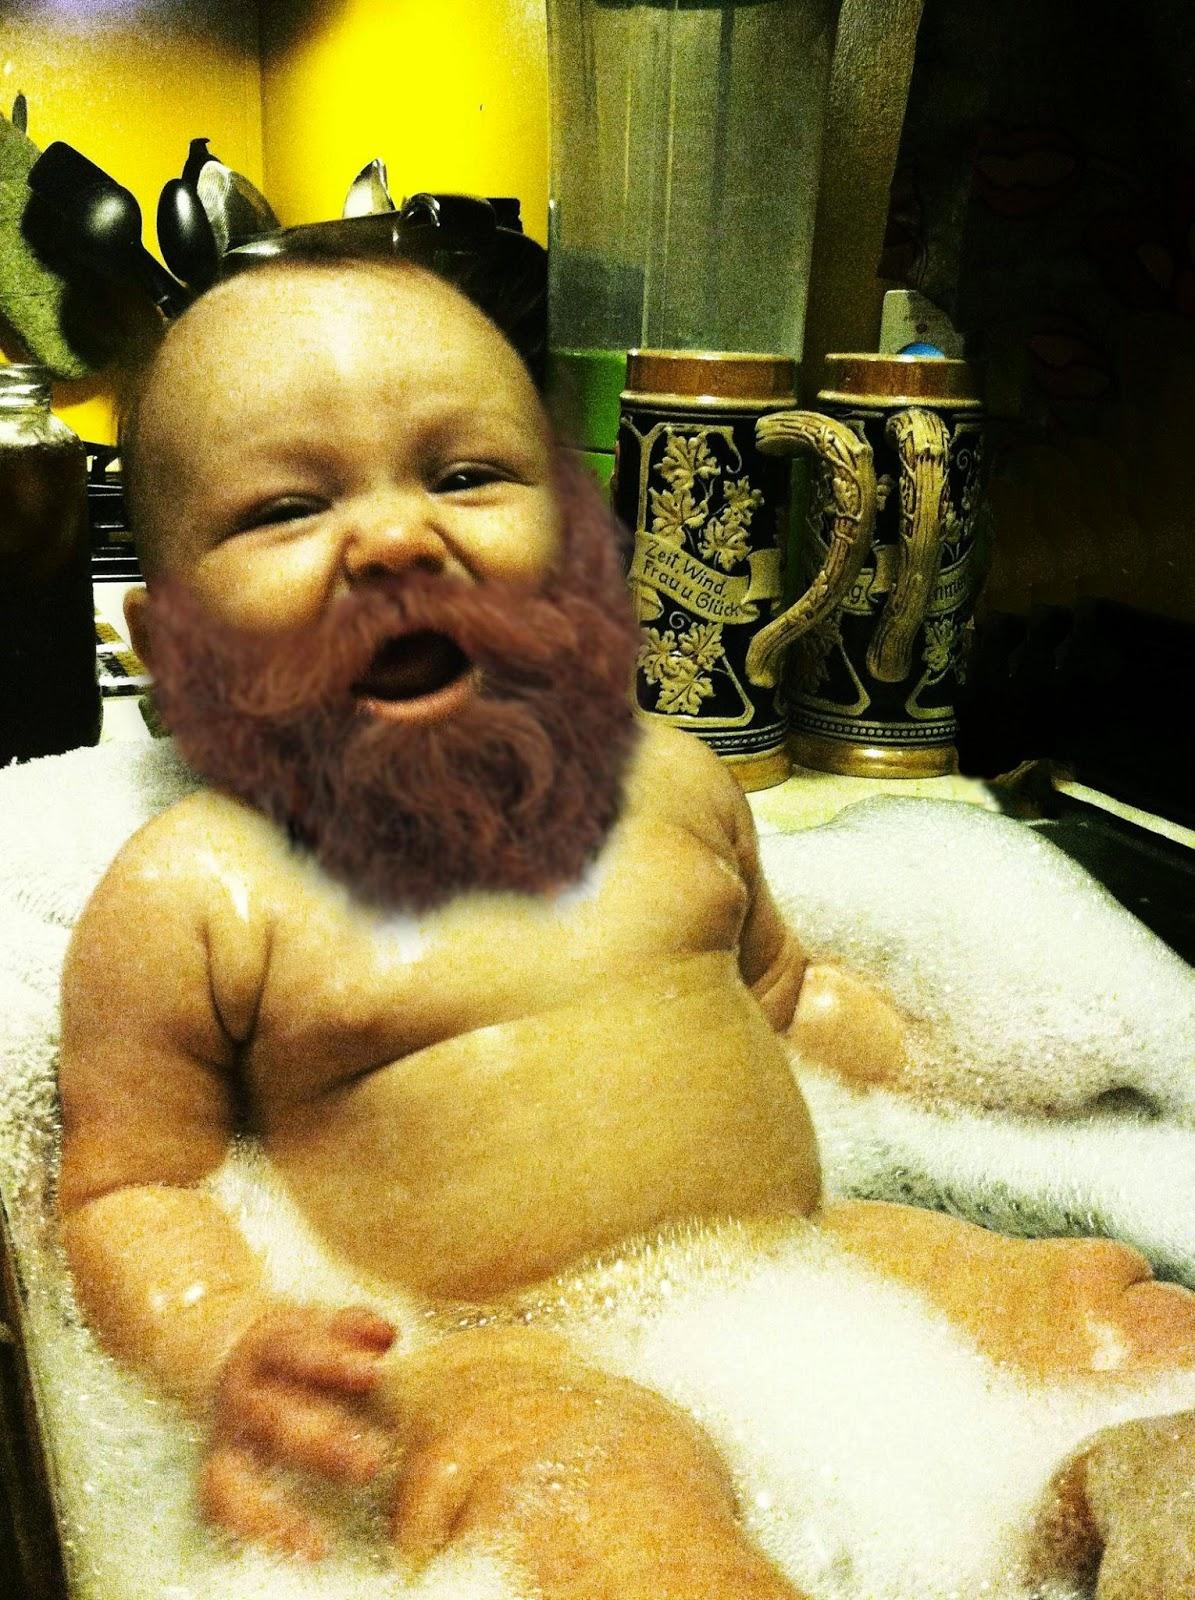 Kumpulan Gambar Bayi Bayi Lucu Dan Gokil Editan Terbaru Foto